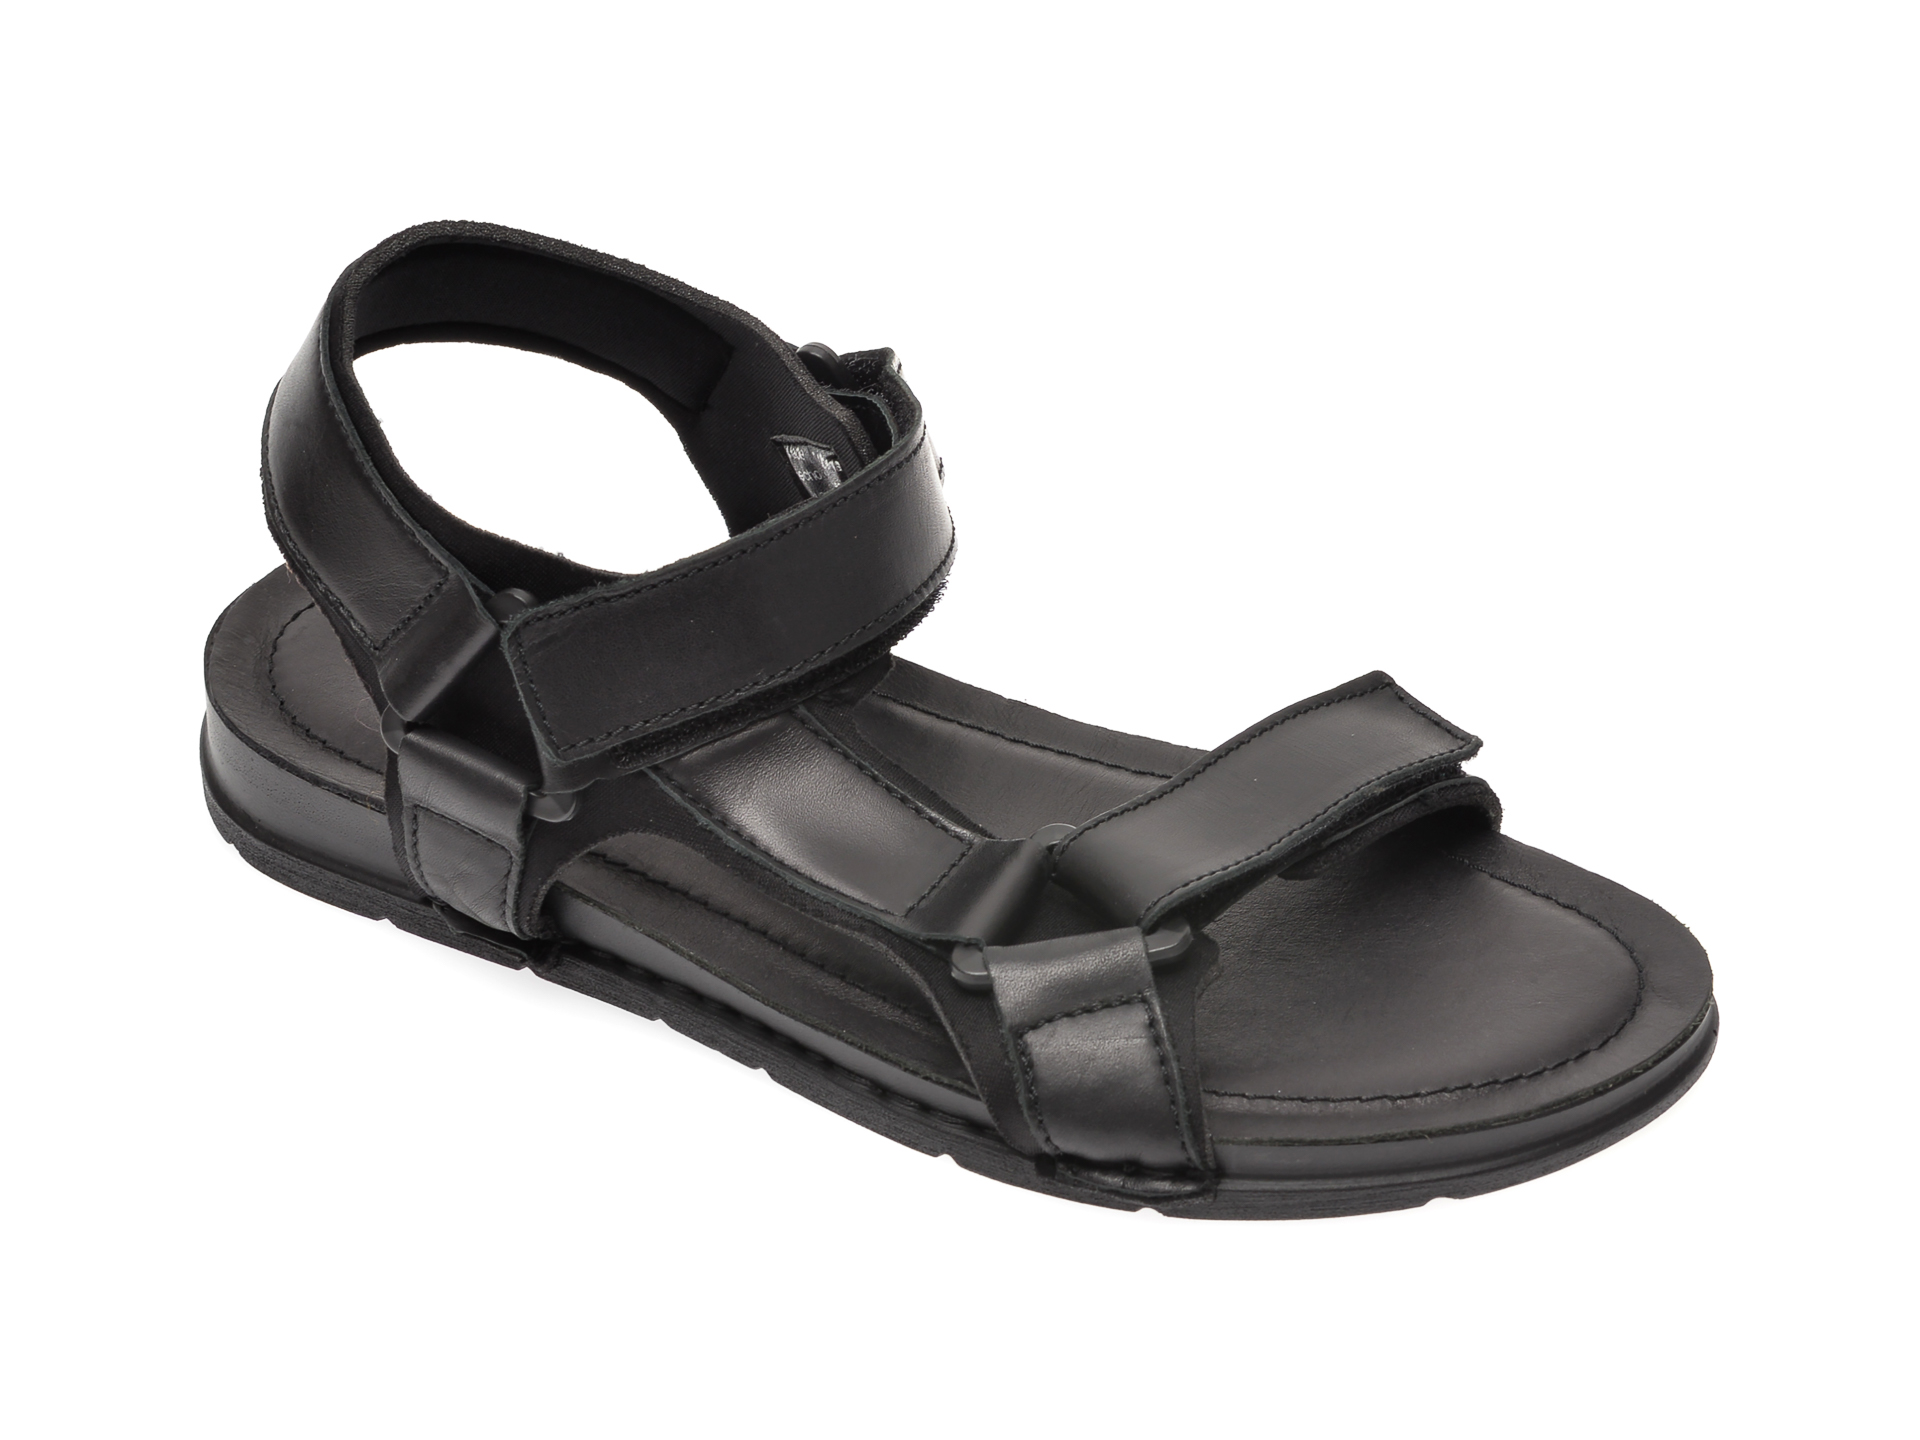 Sandale ALDO negre, Uligolian001, din piele naturala New